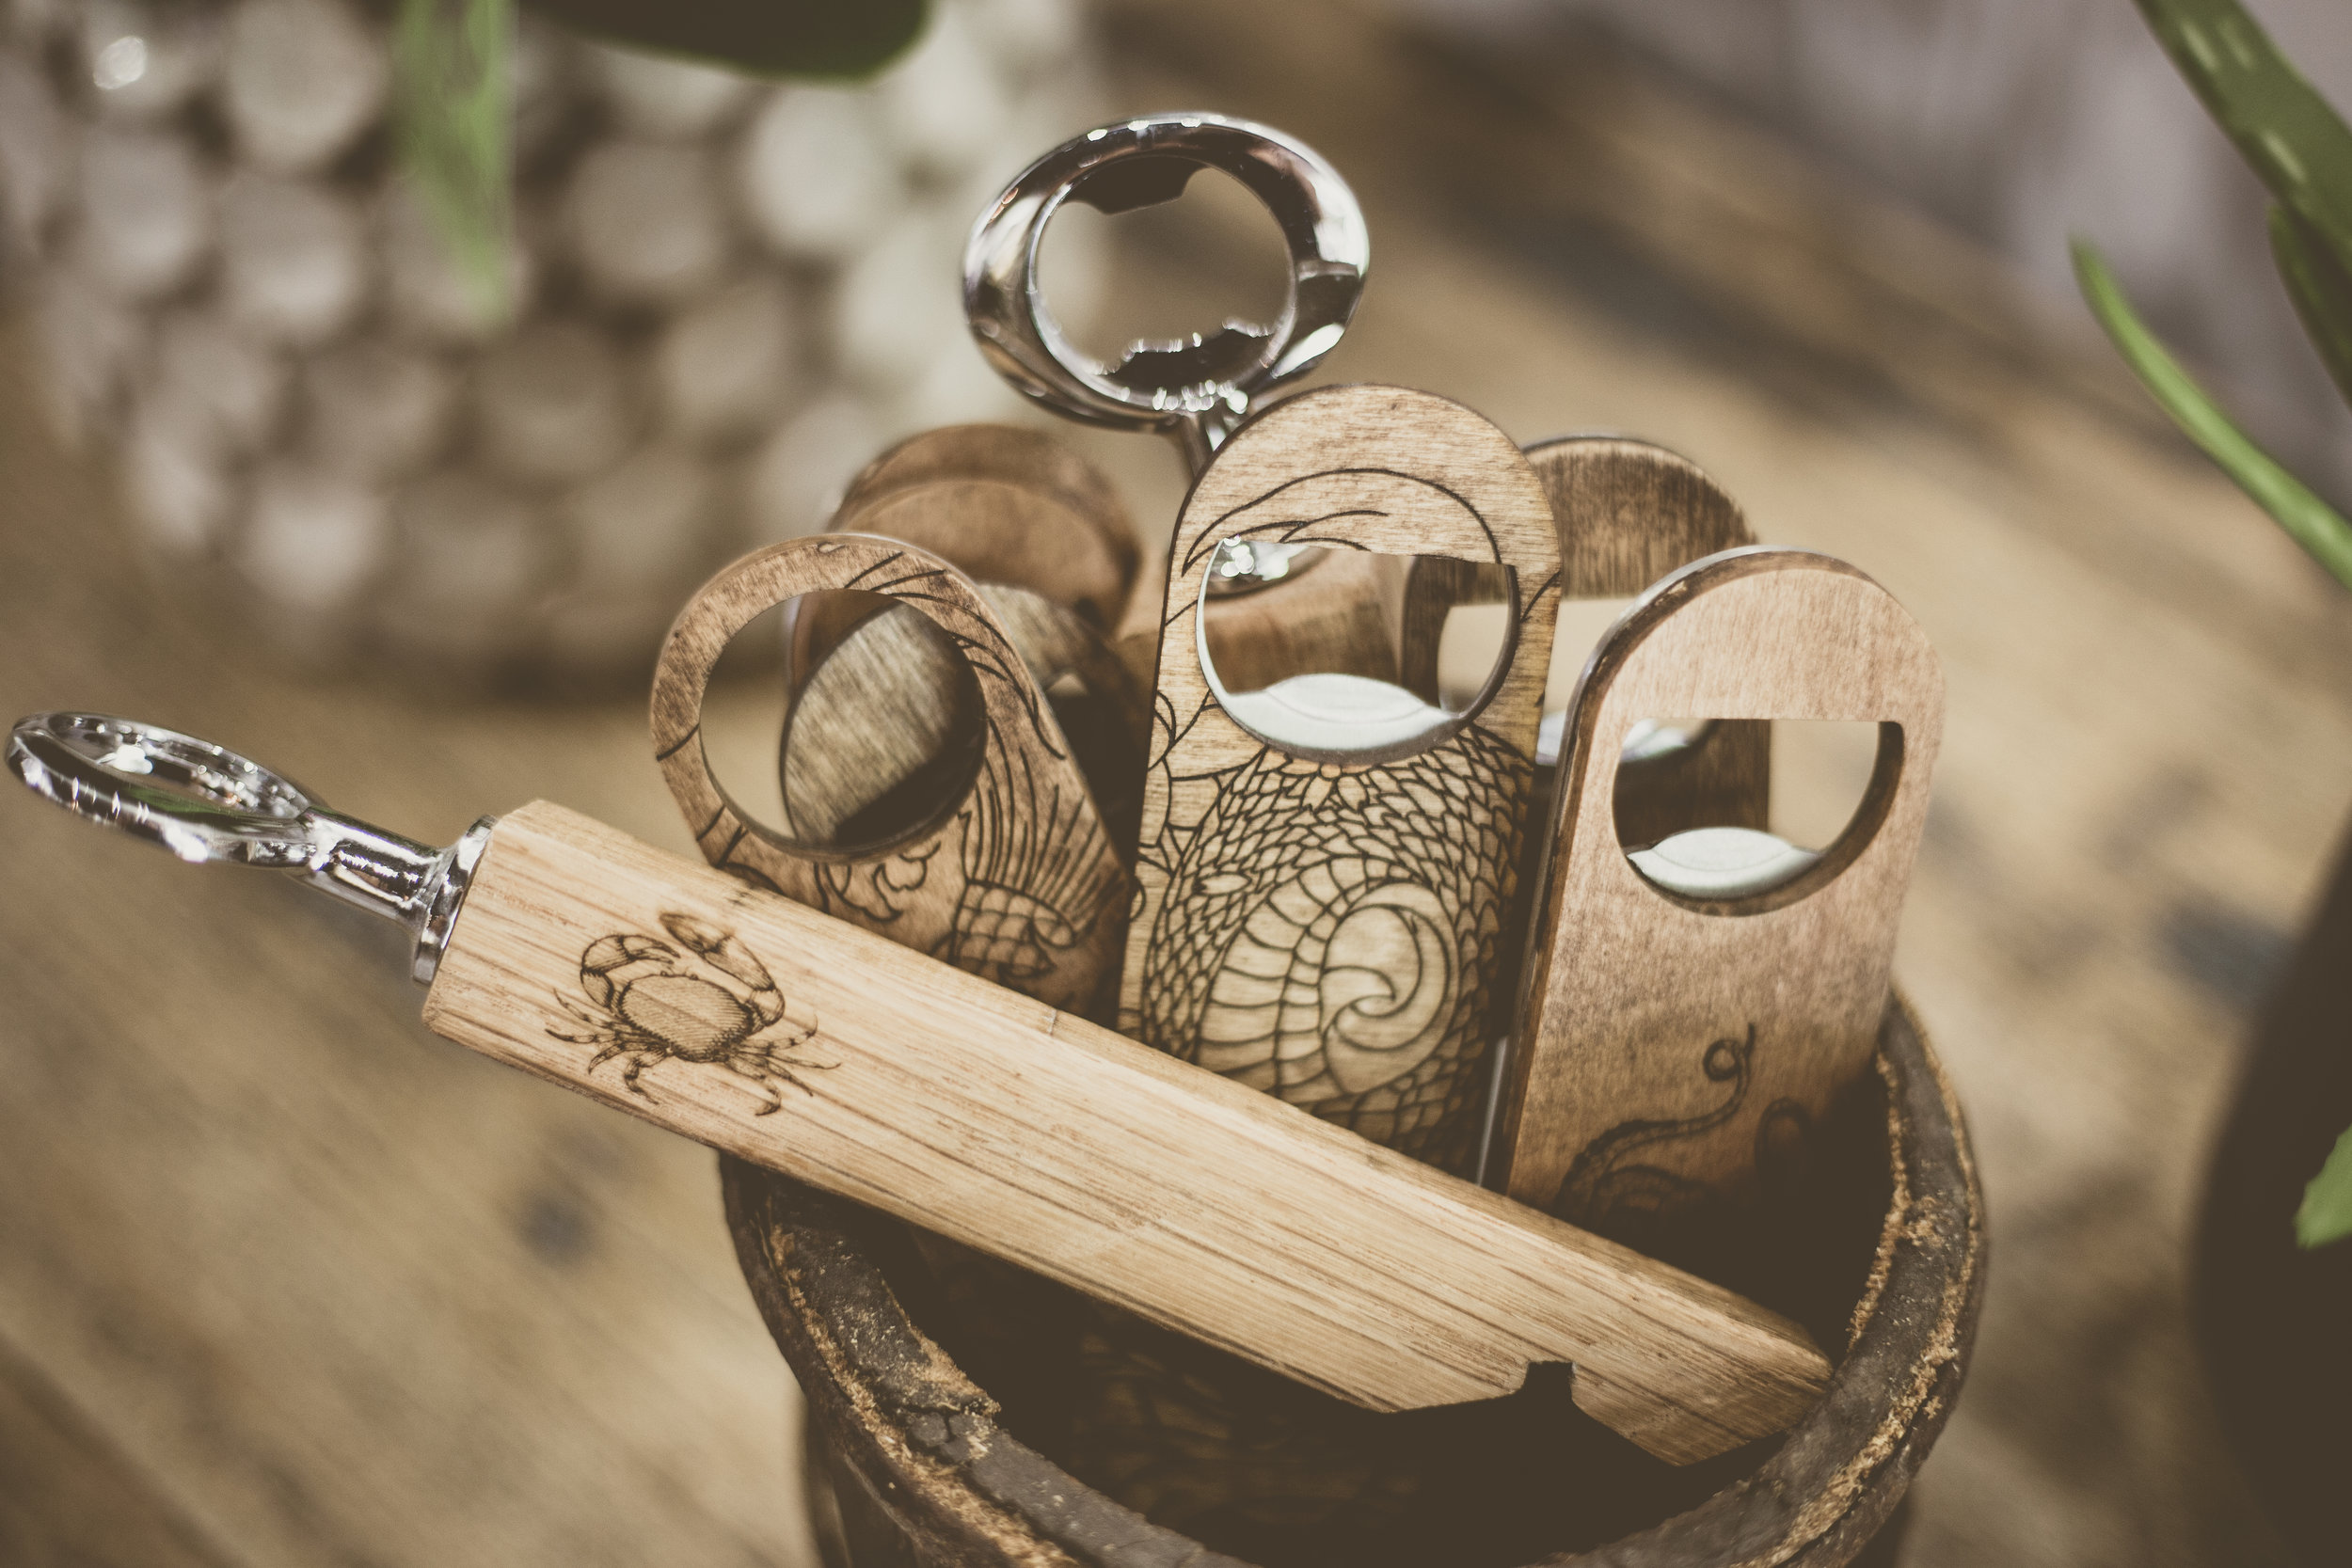 Kelder_Designs_Switchwood_Beer_Opener_Made_From_Whiskey_Barrel.jpg